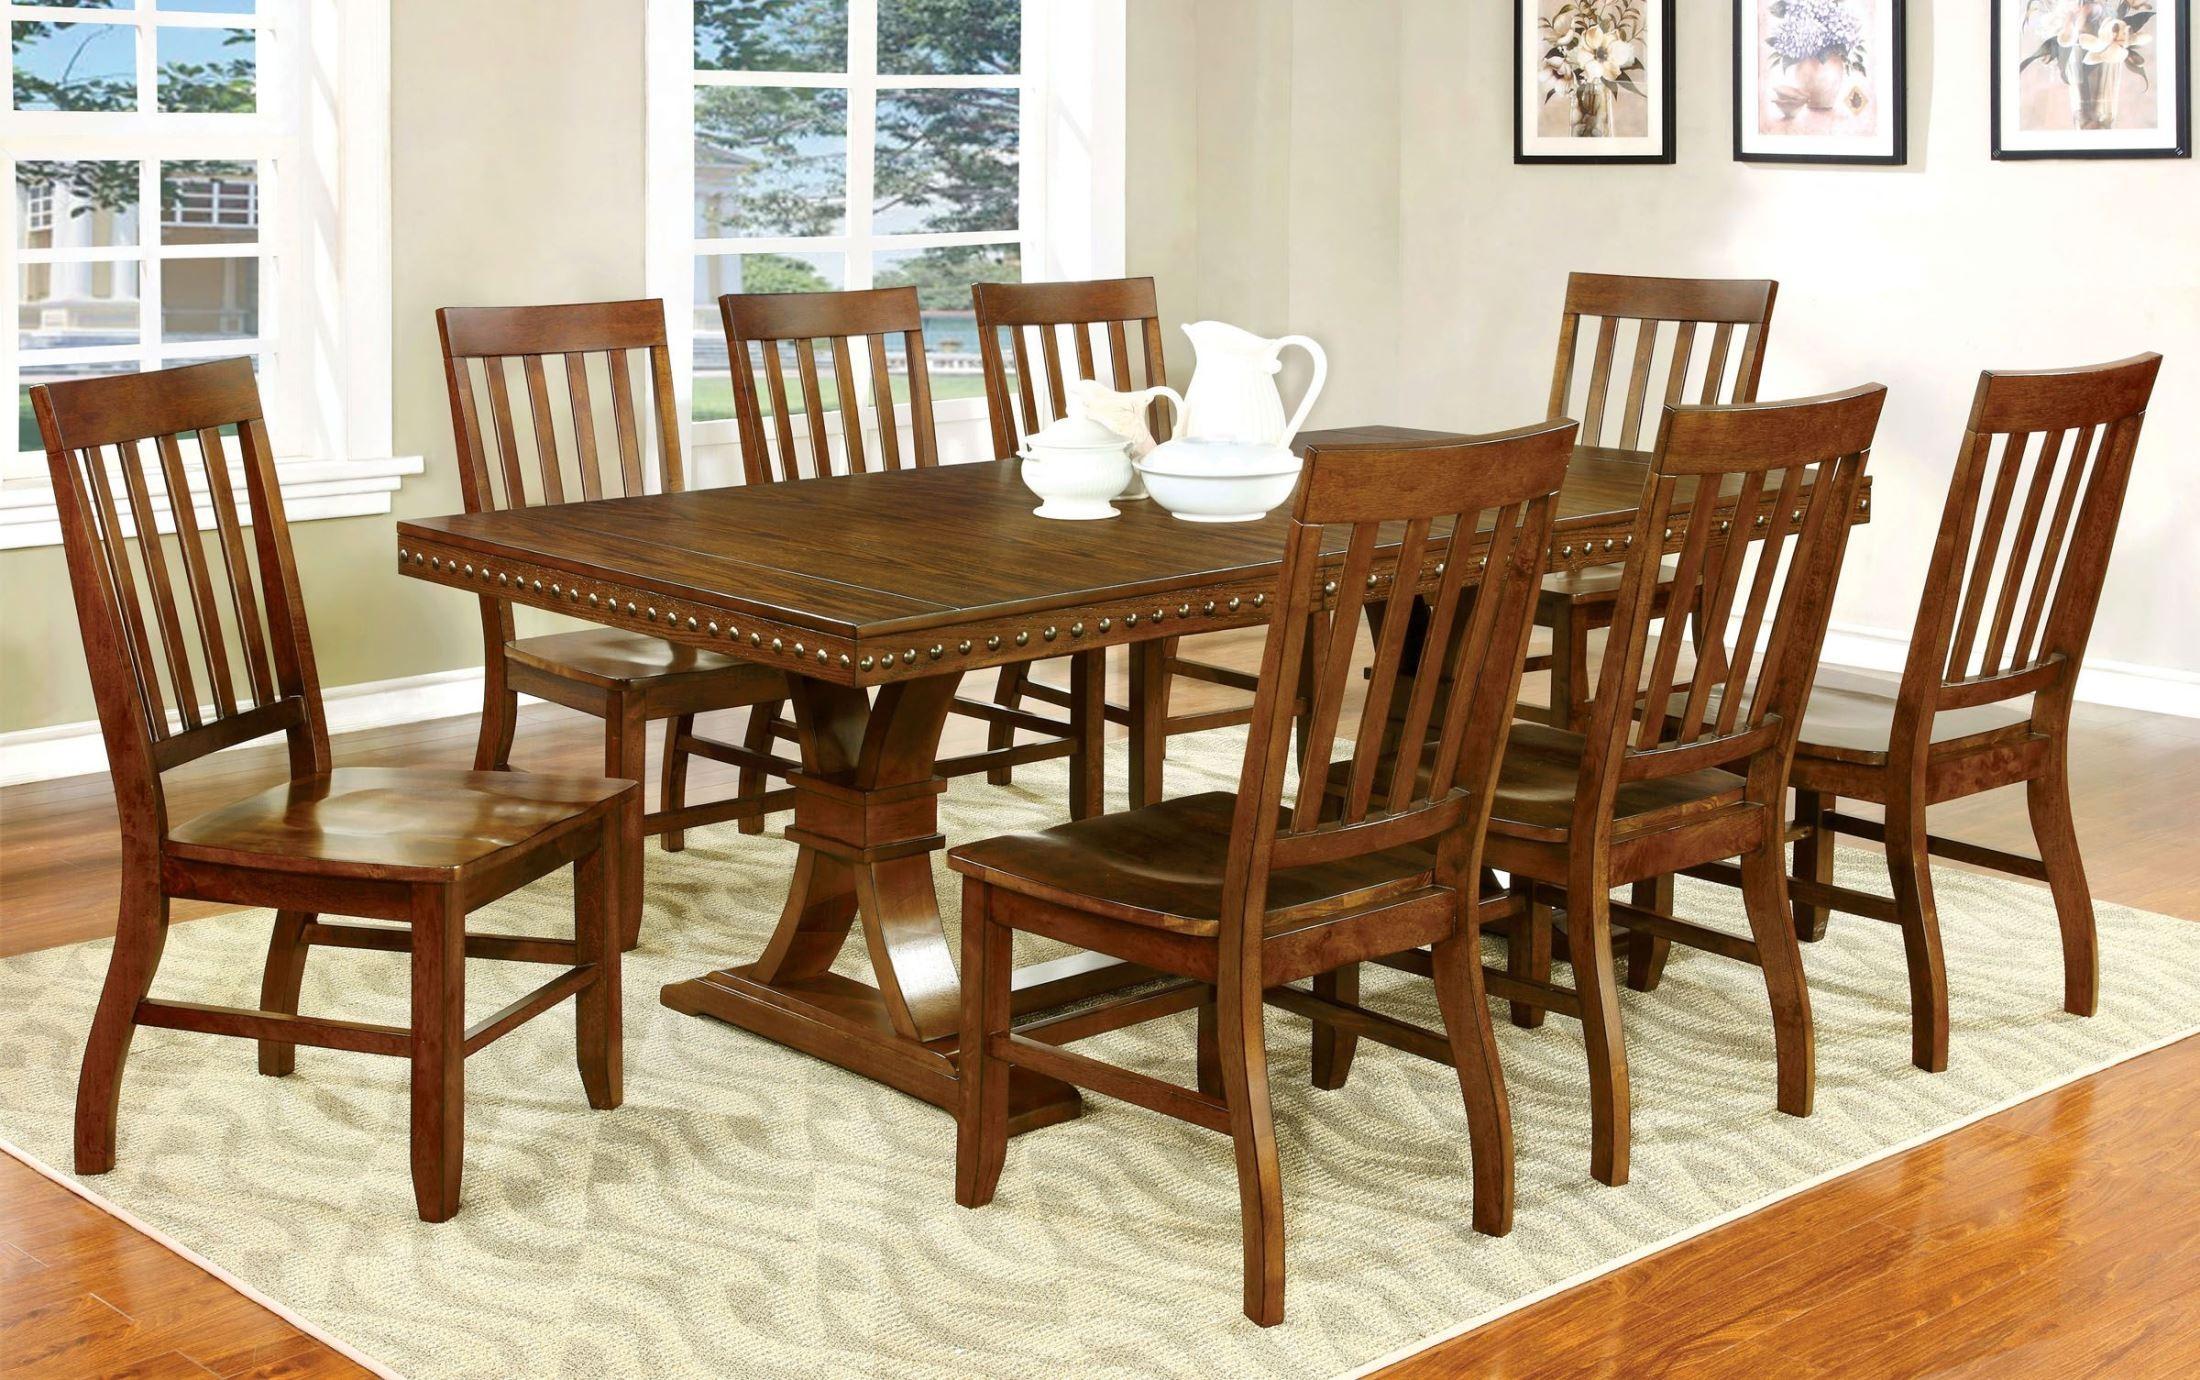 Foster i dark oak rectangular extendable trestle dining table from furniture of america cm3437t - Dark oak dining tables ...